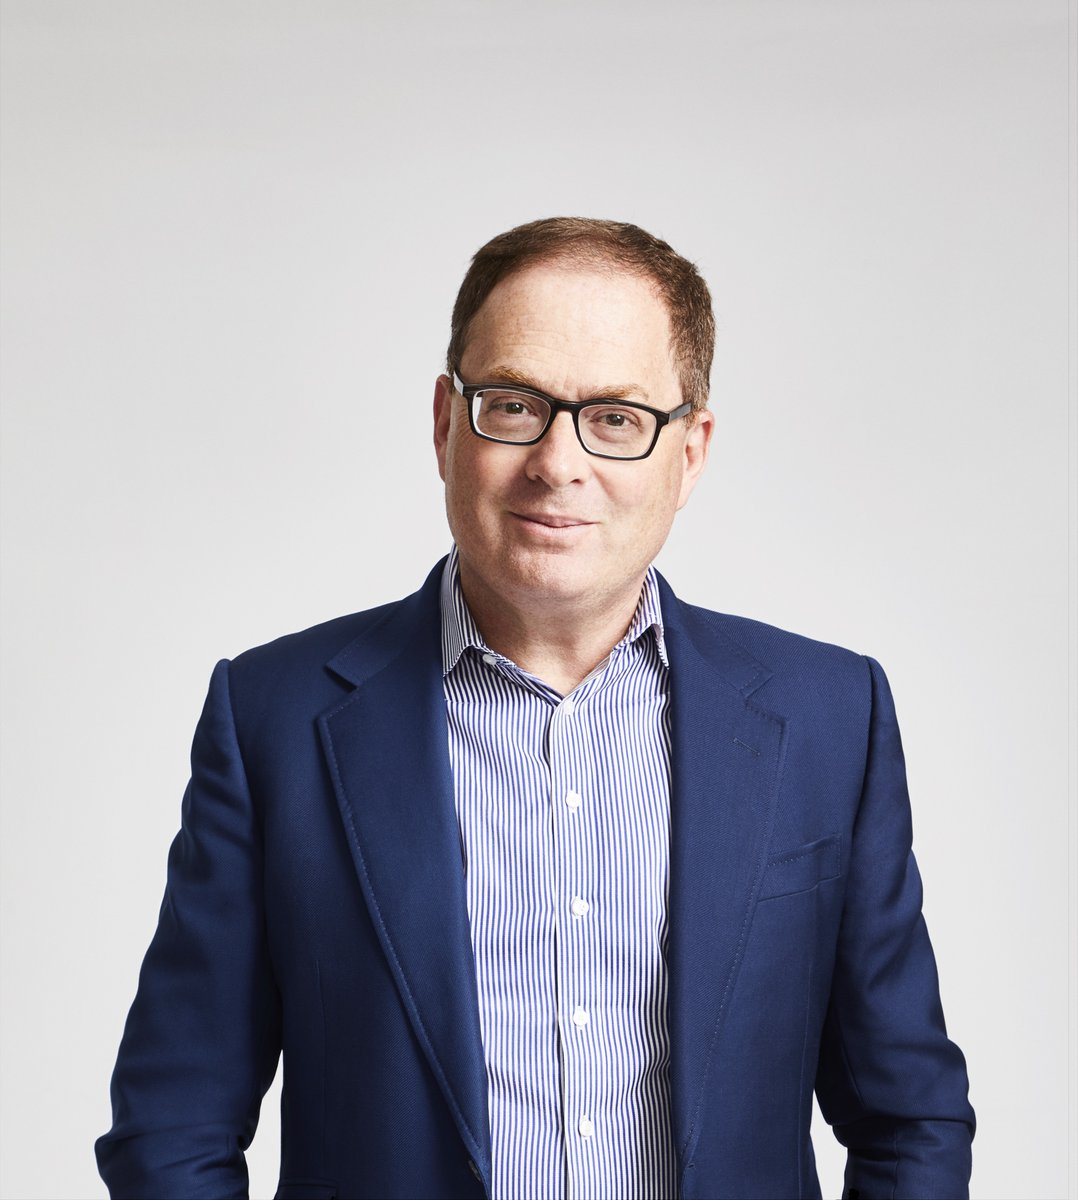 Hearst Names David Carey Senior Vice President, Public Affairs and Communications bit.ly/2E7fe0u